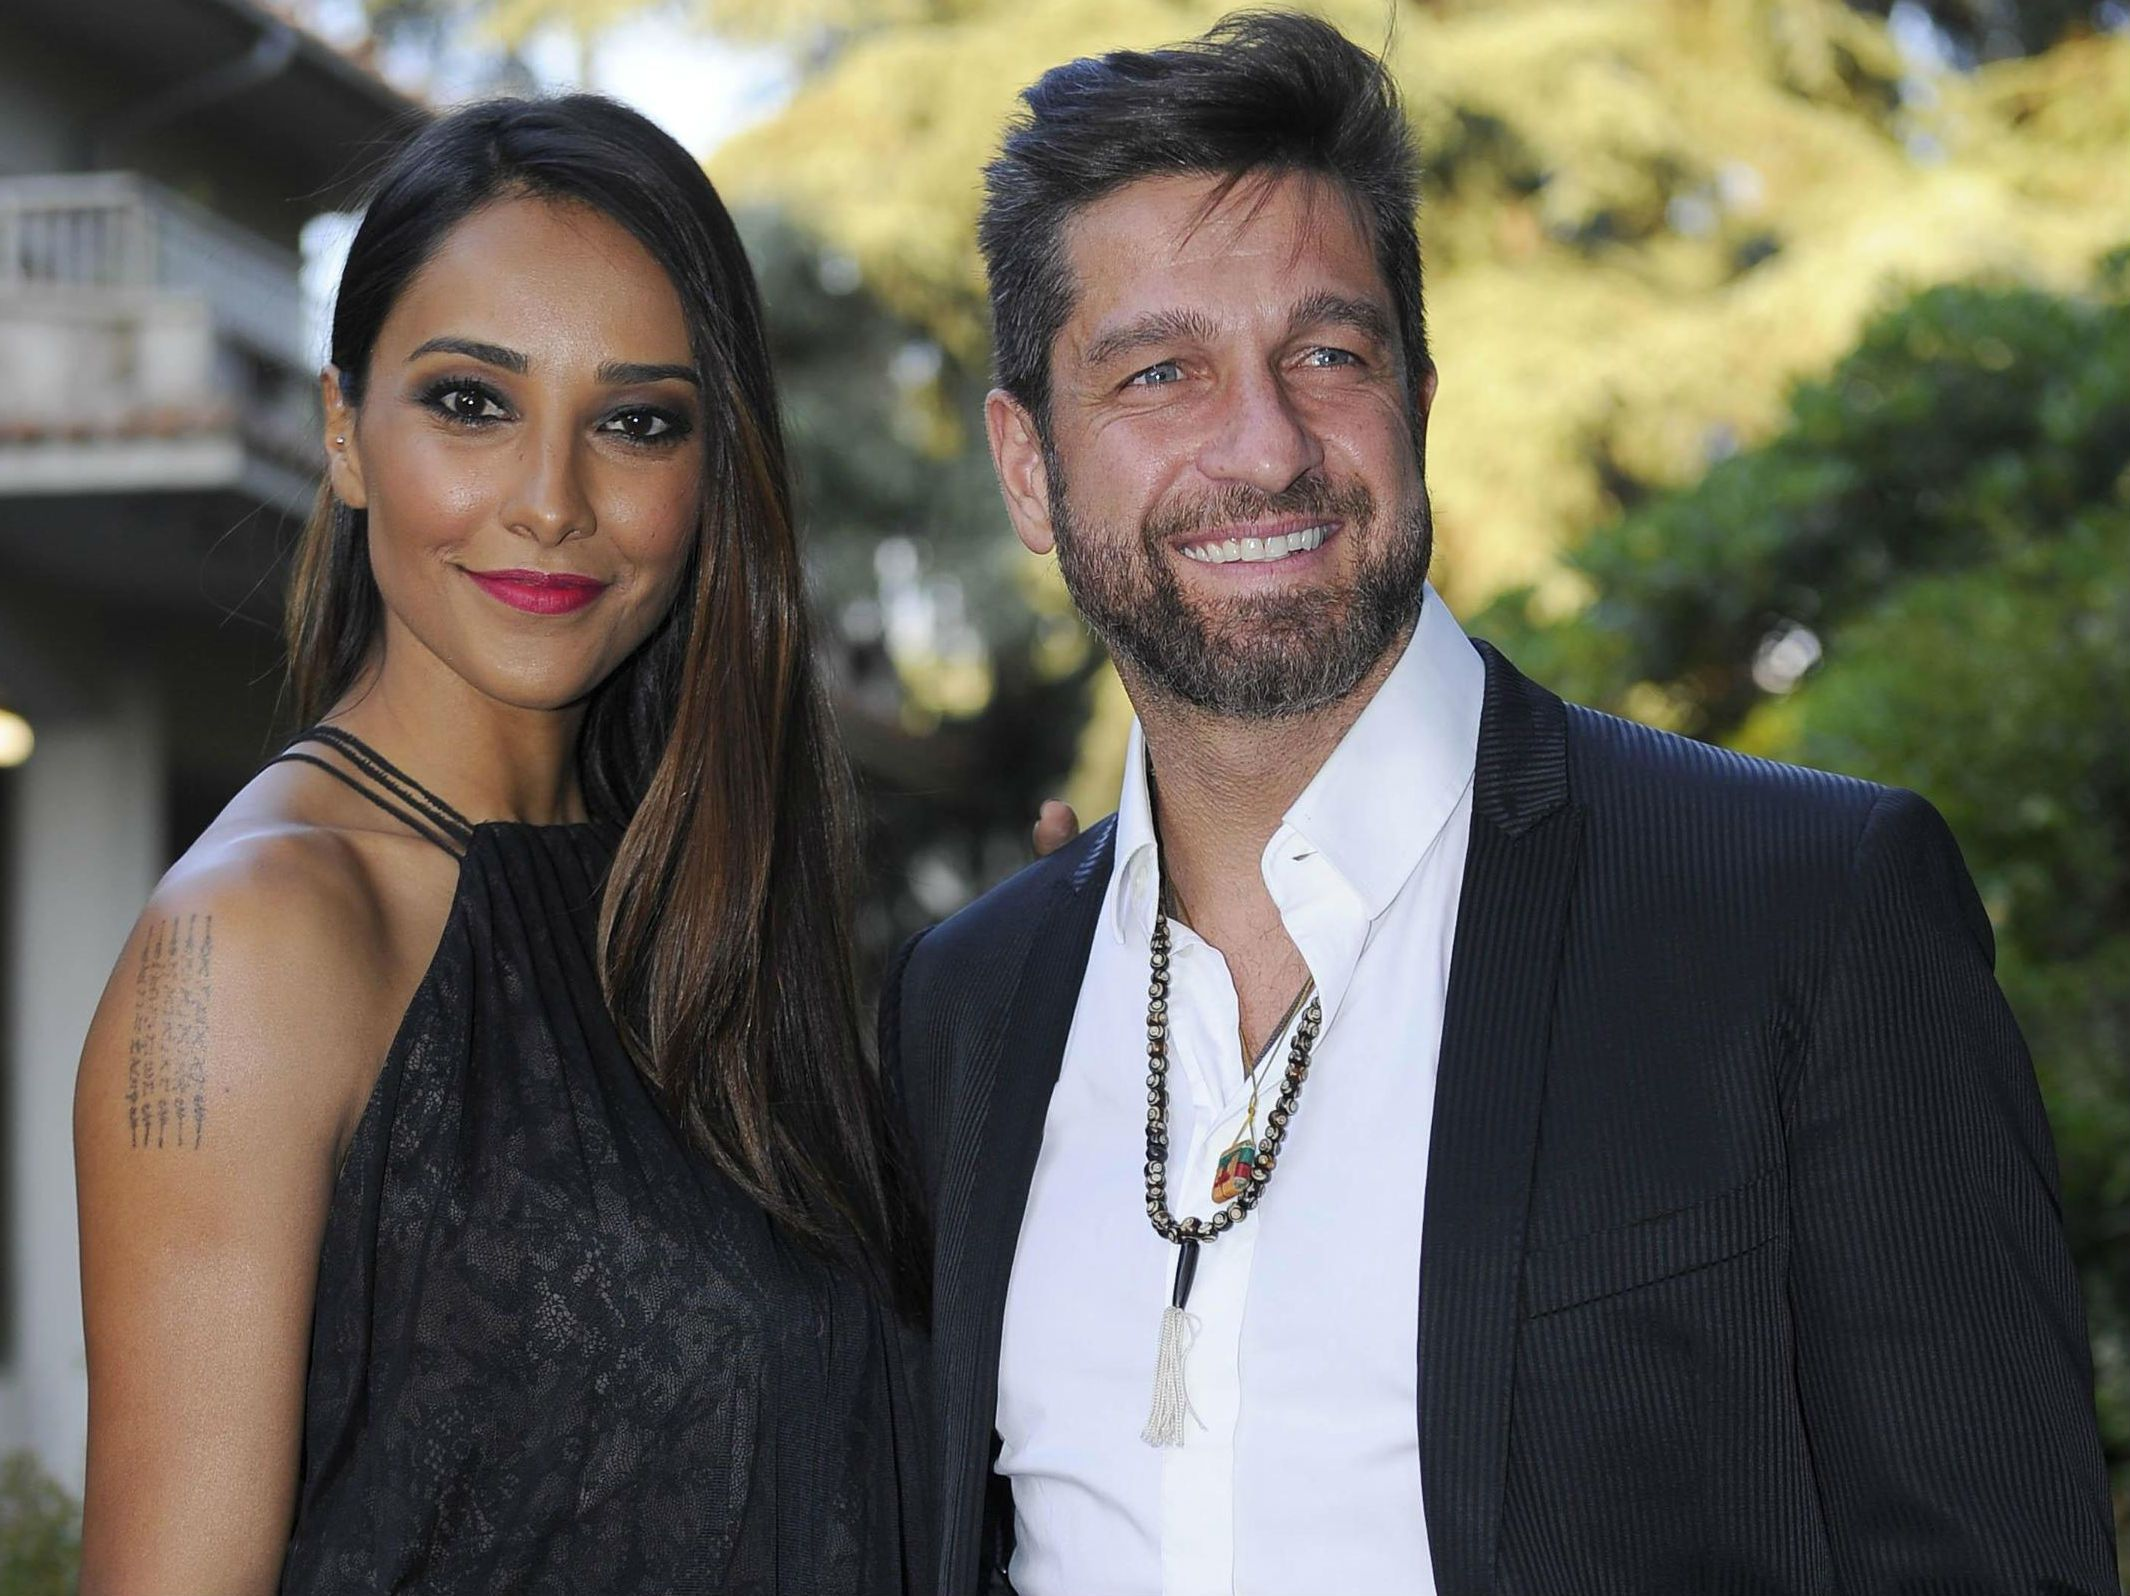 Edoardo Stoppa e Juliana Moreira sposi: il matrimonio a novembre 2017